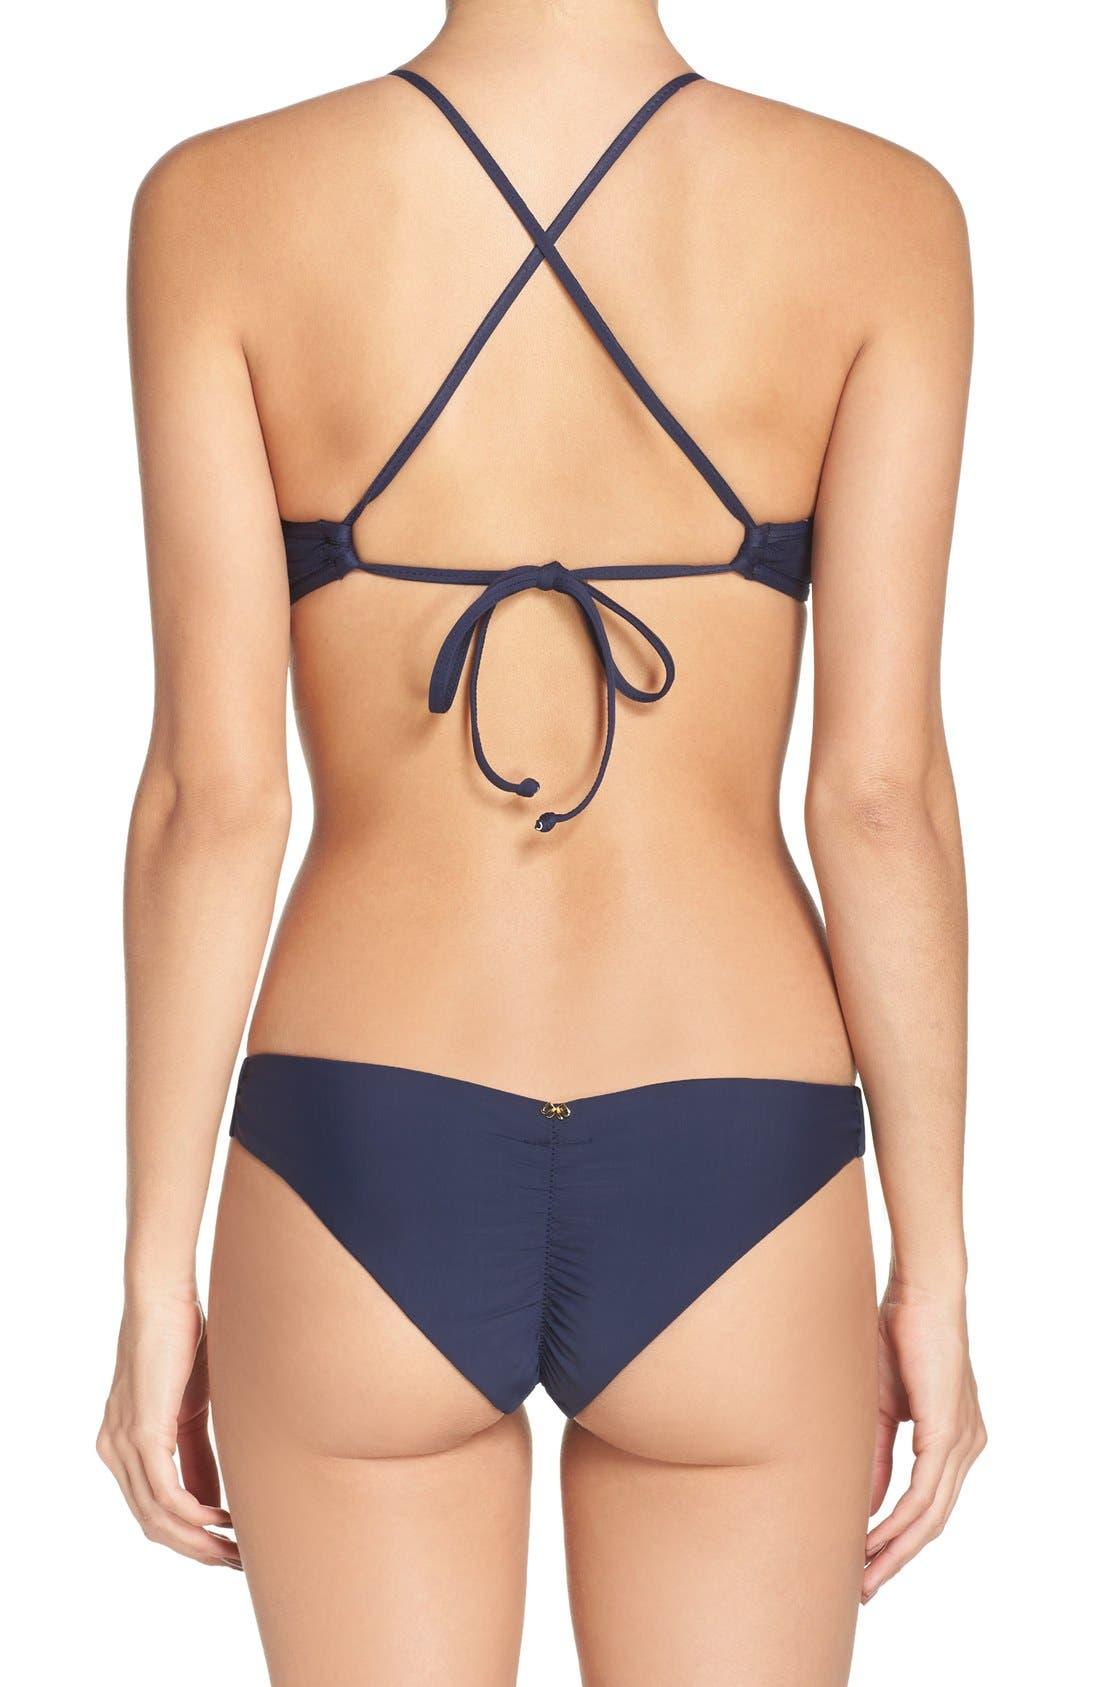 Sequin Bikini Top,                             Alternate thumbnail 10, color,                             401